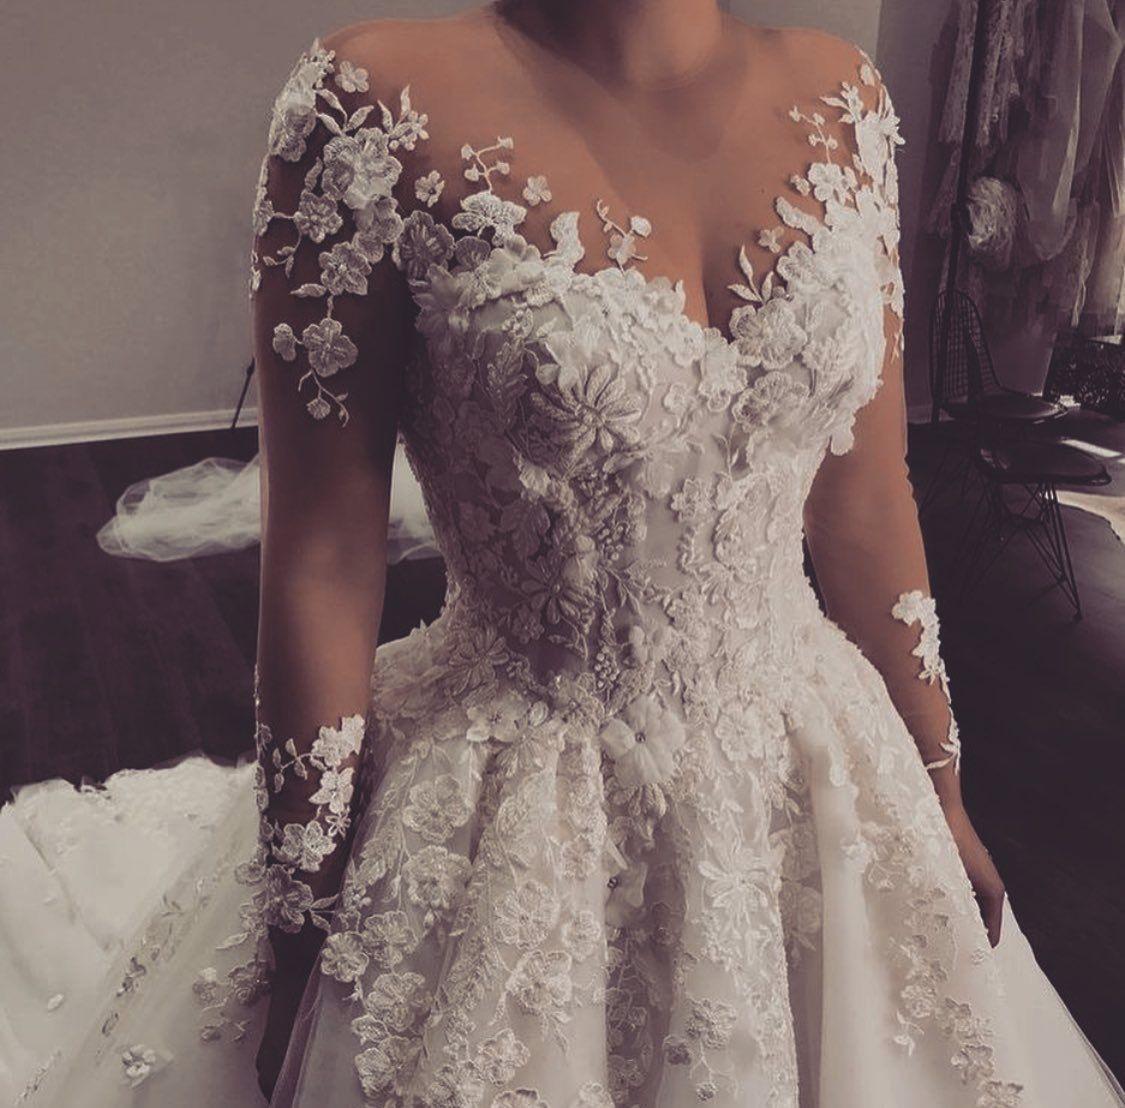 Pin by lilia on wedding dresses in pinterest wedding